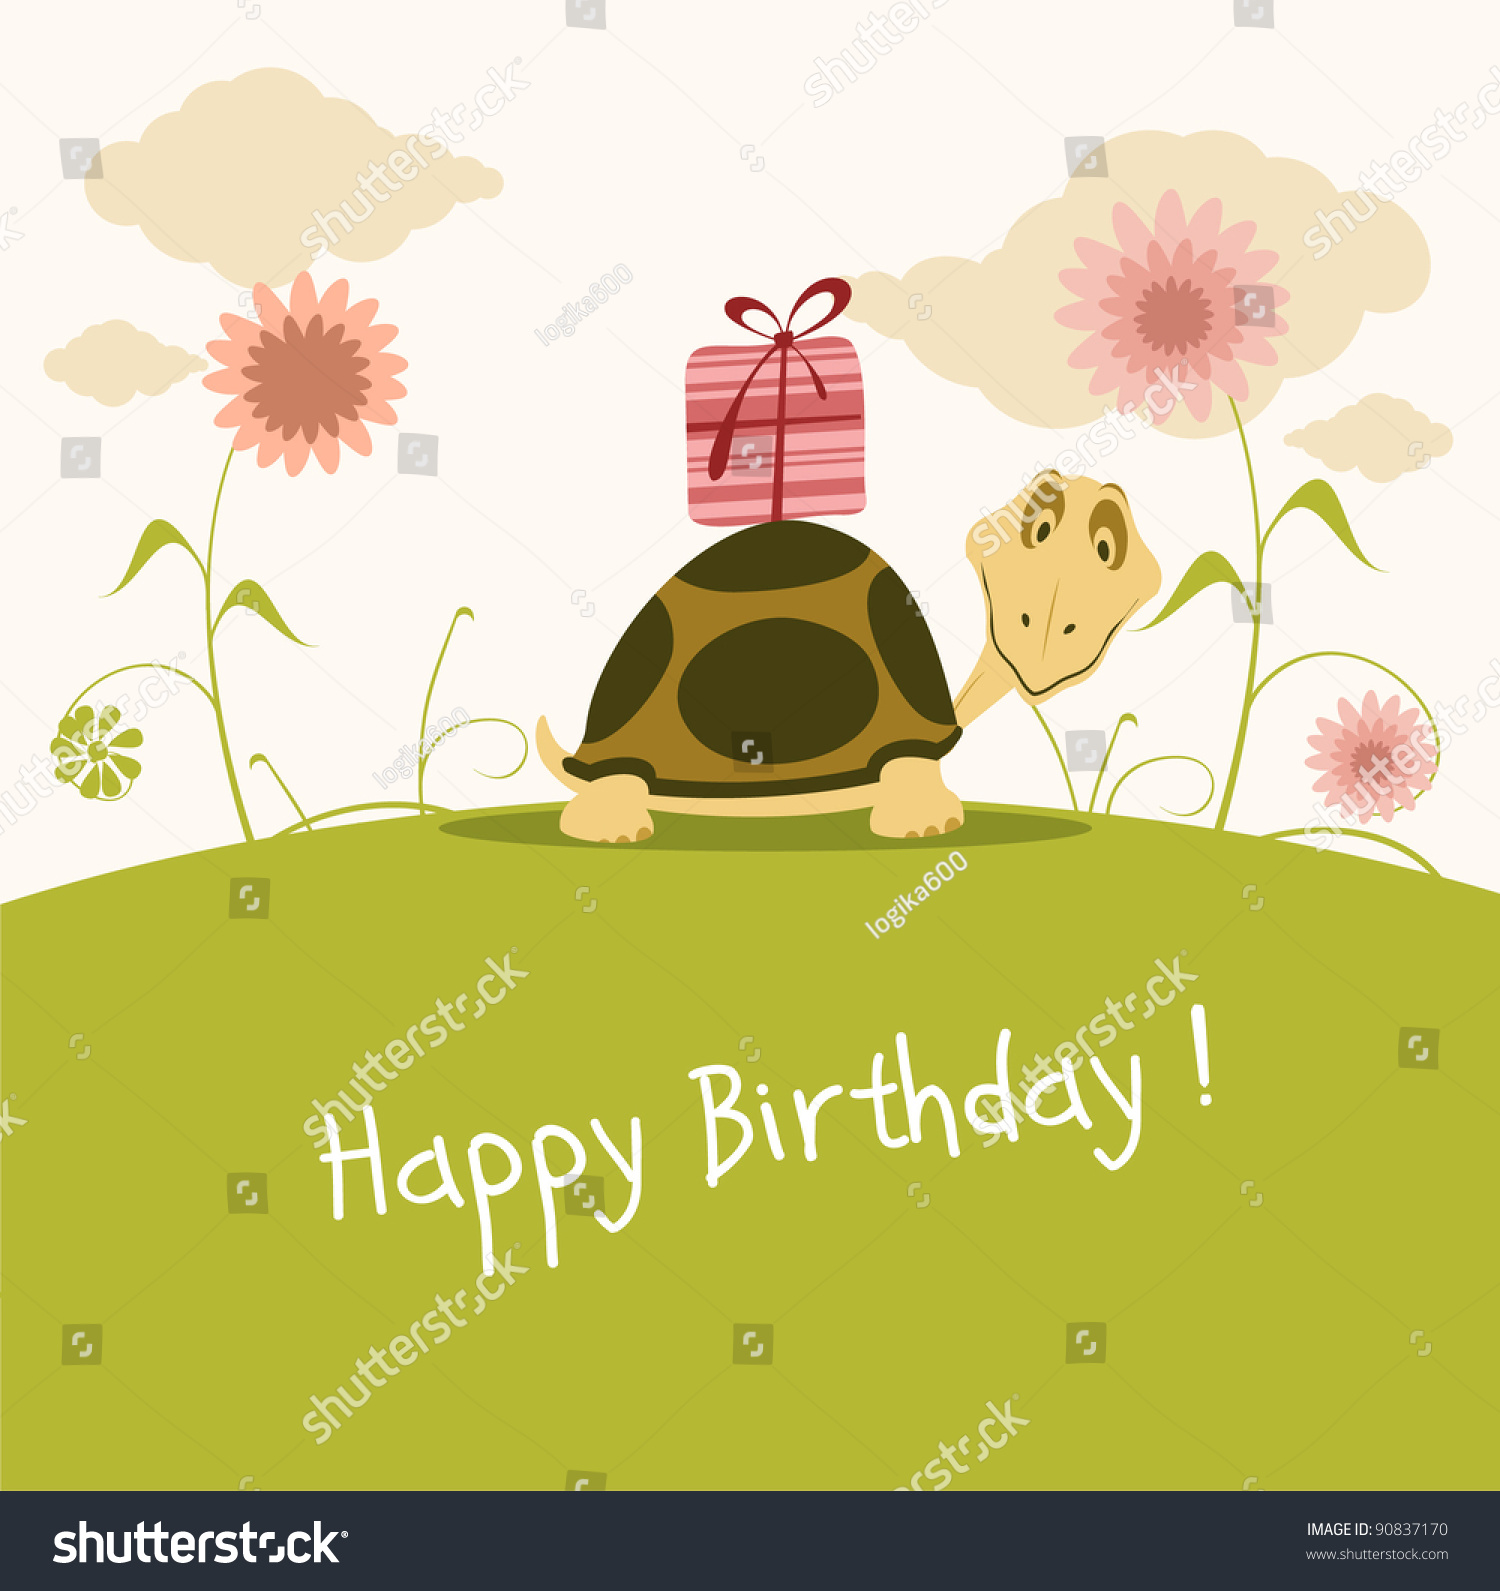 Happy Birthday Card Cute Turtle Vector 90837170 Shutterstock – Happy Birthday Card Cute